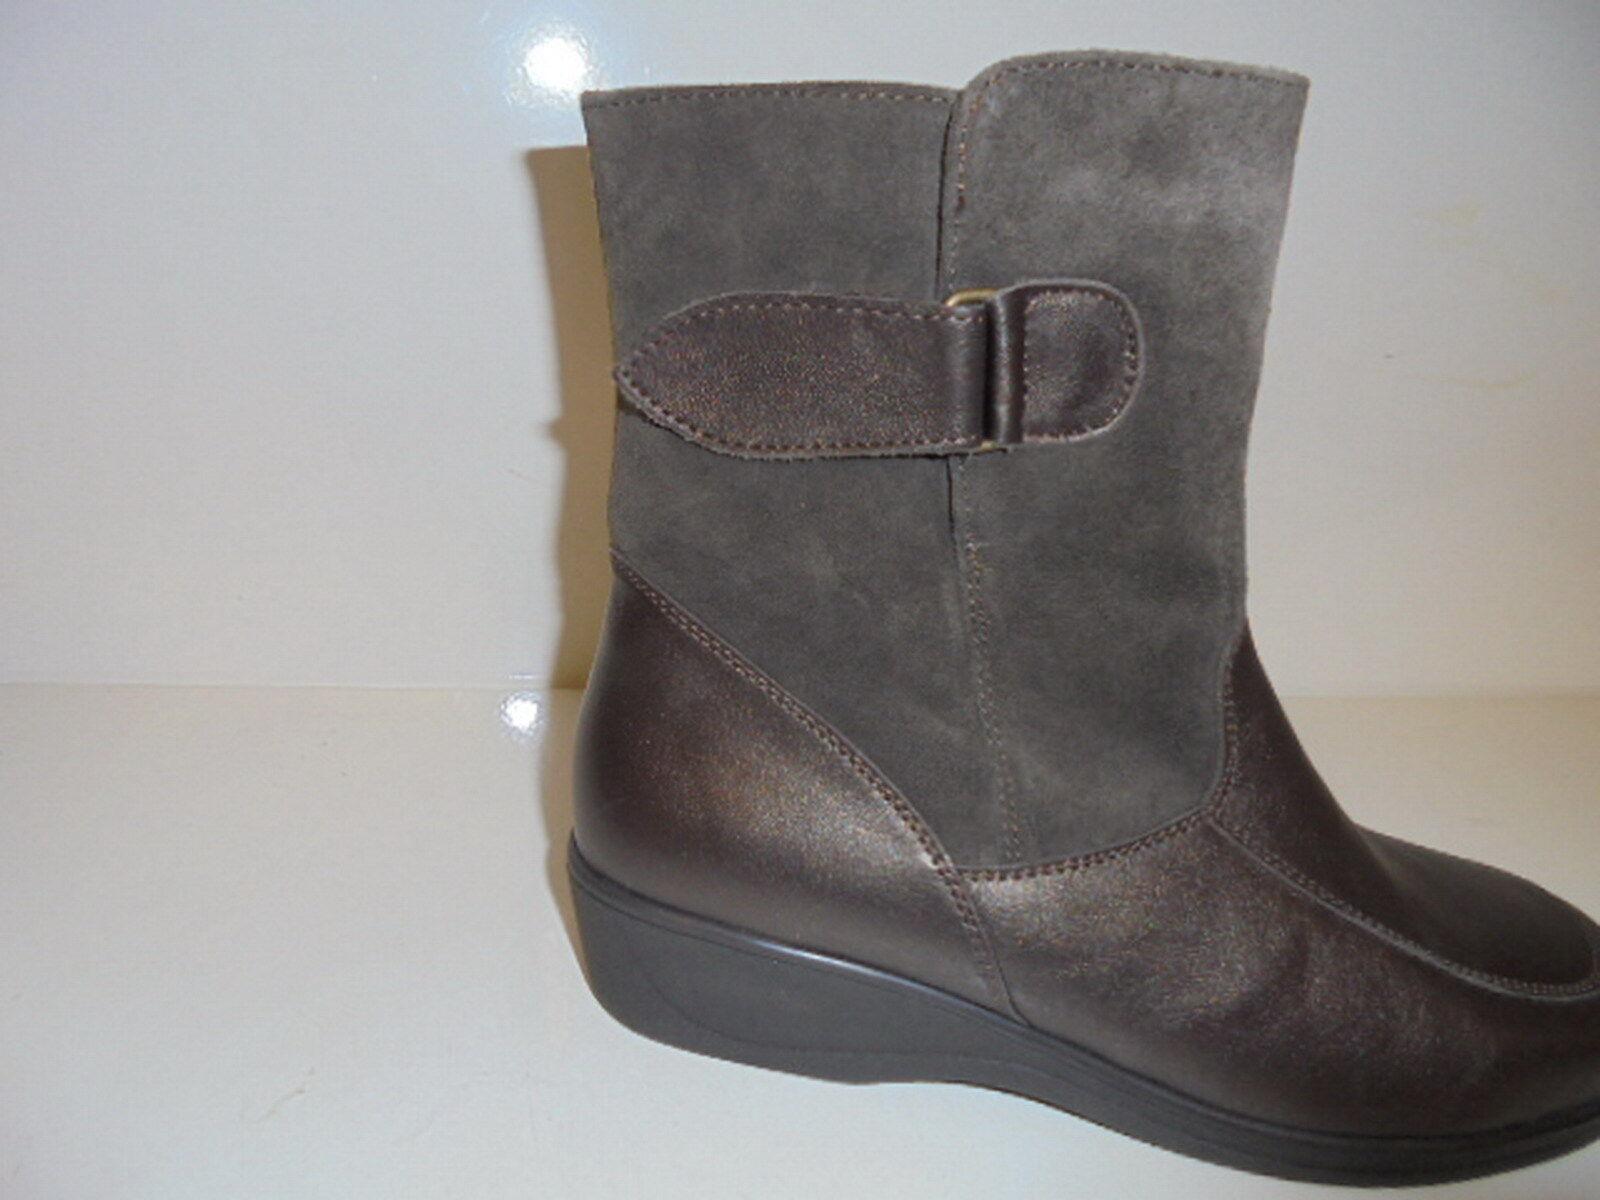 33068 Meisi Damenschuhe Stiefelette Stiefel Leder Leder Leder braun perlato UK 5 Gr.38  | Hohe Qualität Und Geringen Overhead  102e0e